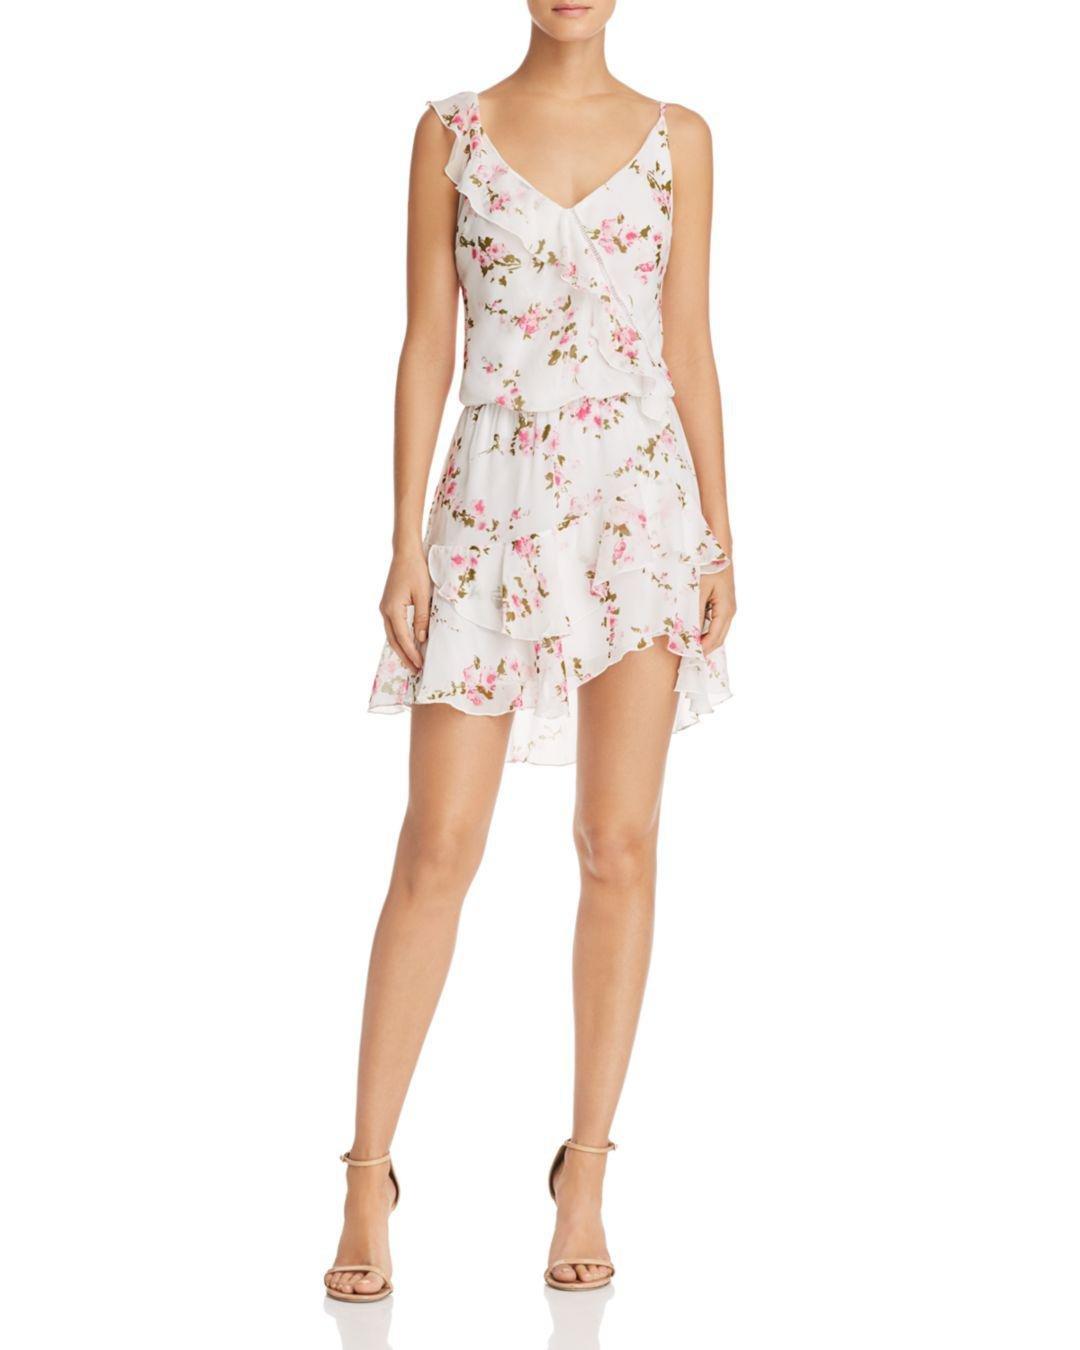 cc89d44555d Karina Grimaldi Paloma Floral-print Ruffled Dress in White - Lyst